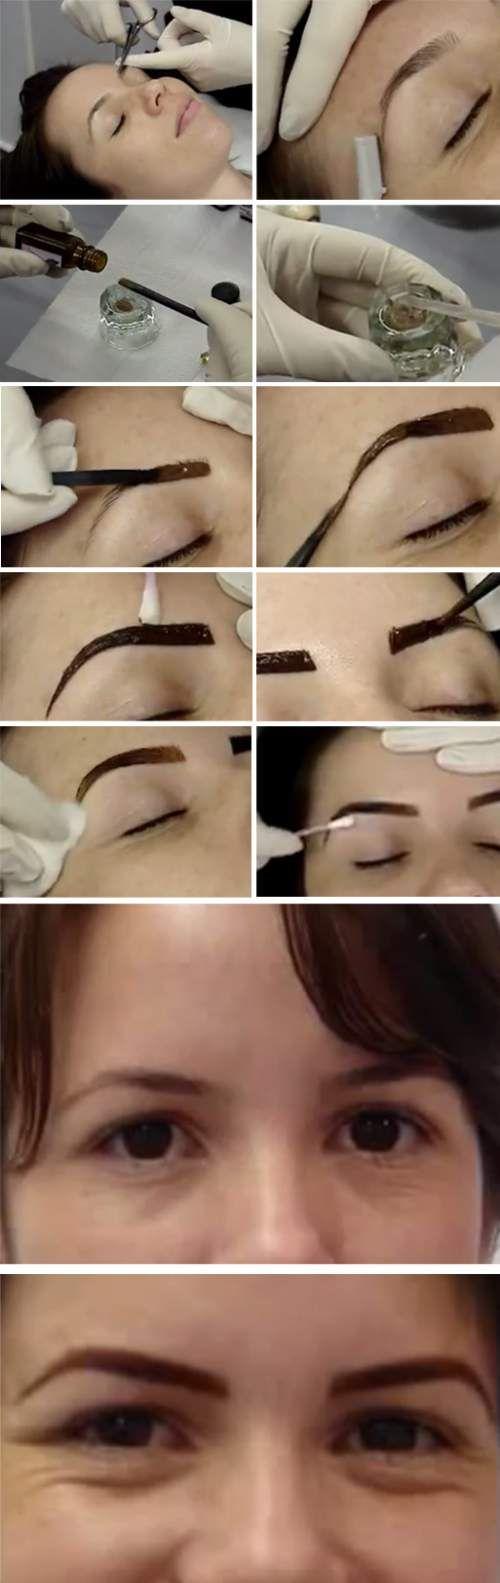 Right Way To Use Henna For Eyebrow Dye Henna Eyebrows Eyebrow Tinting Henna Hair Dyes